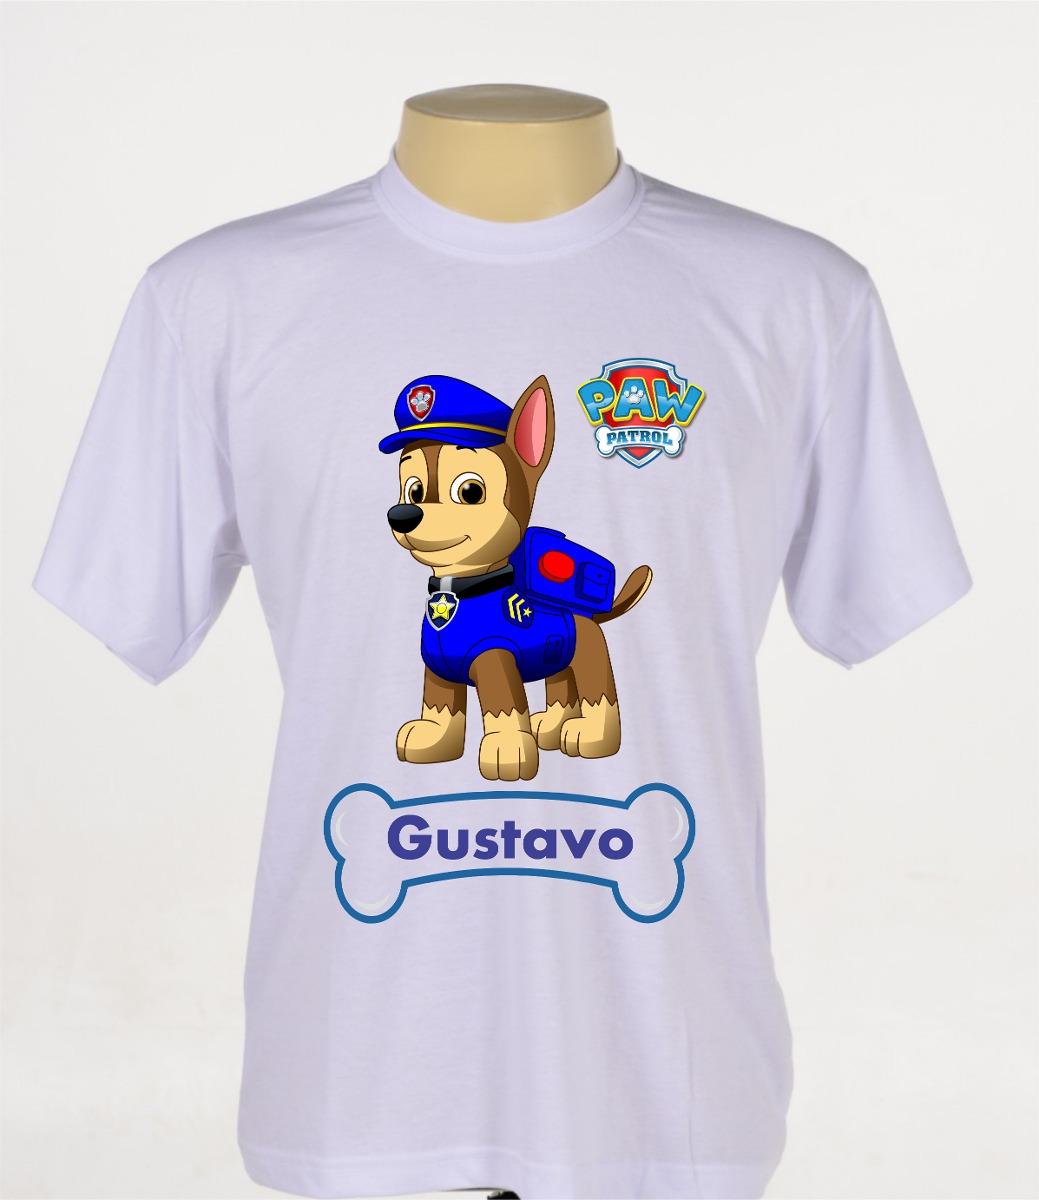 52143628fbde0 camisa camiseta estampada infantil patrulha canina chase. Carregando zoom.